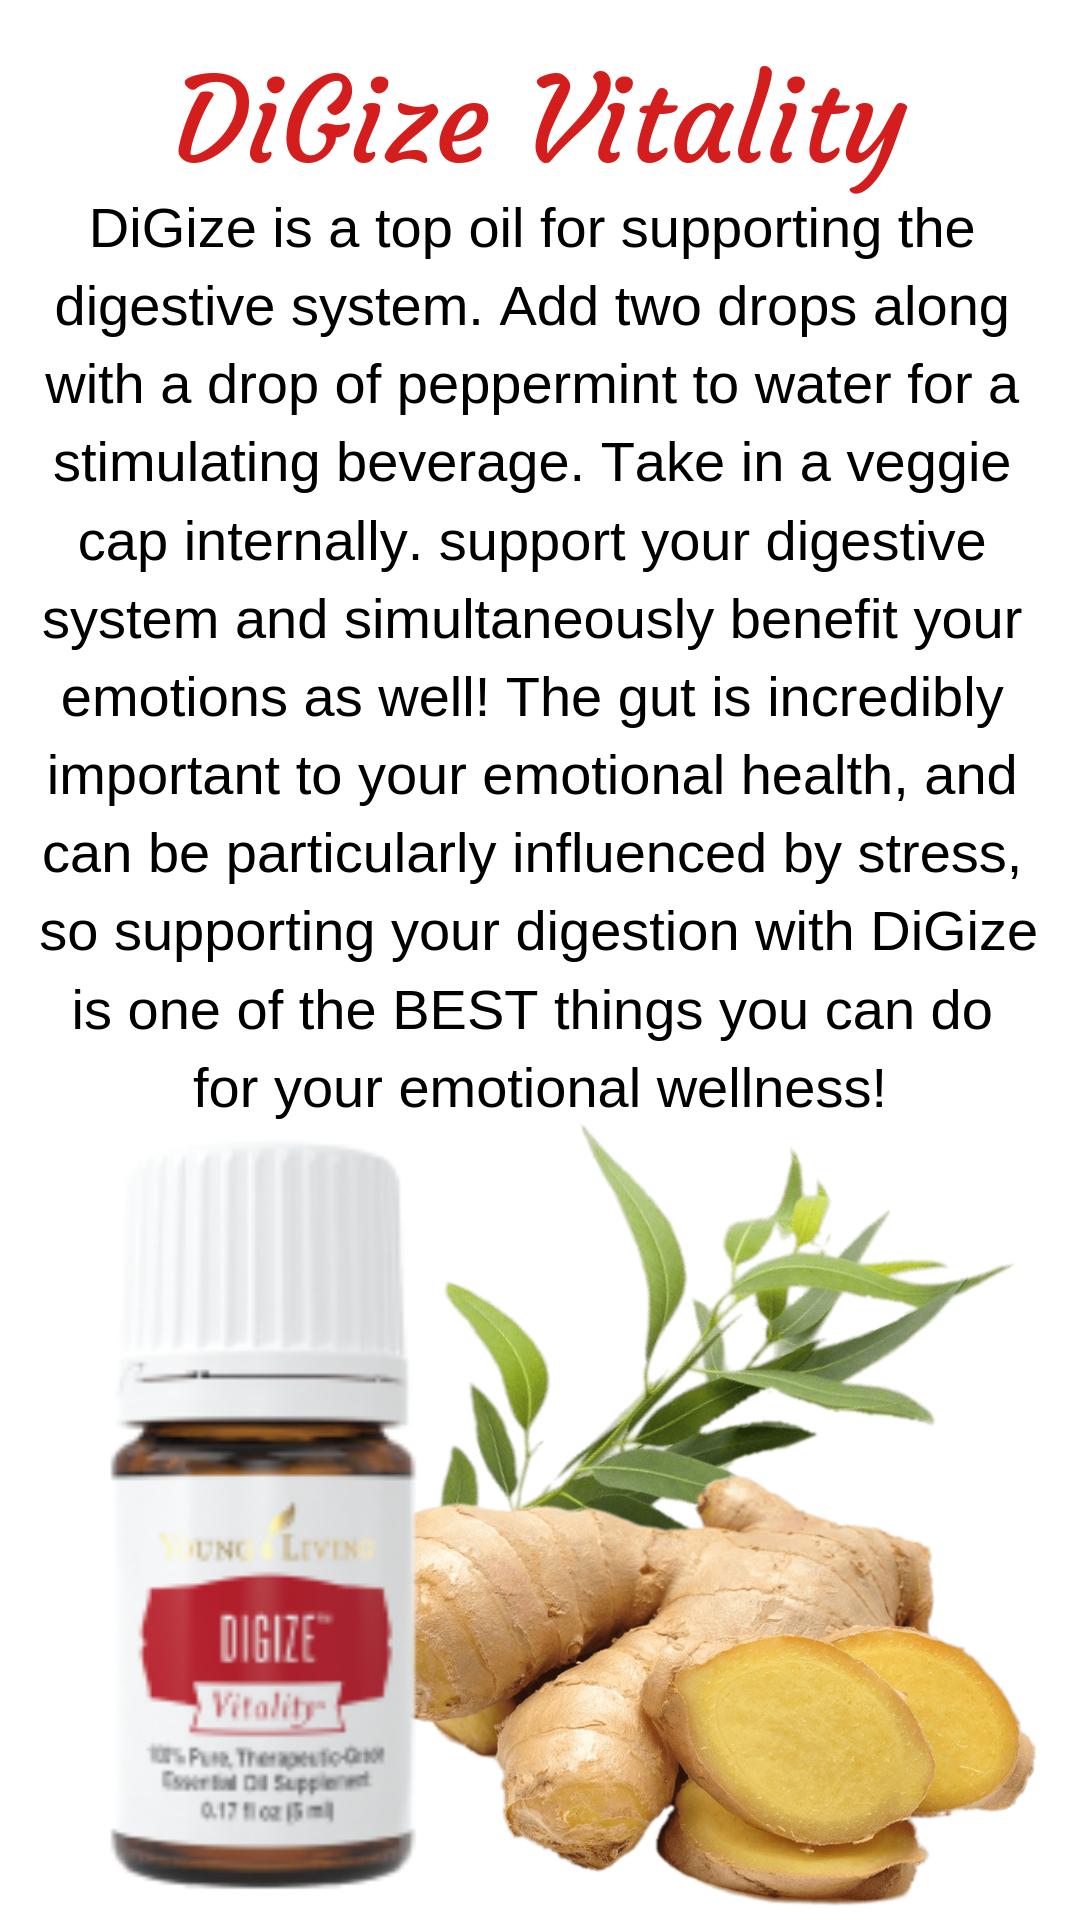 digize-vitality-story-card